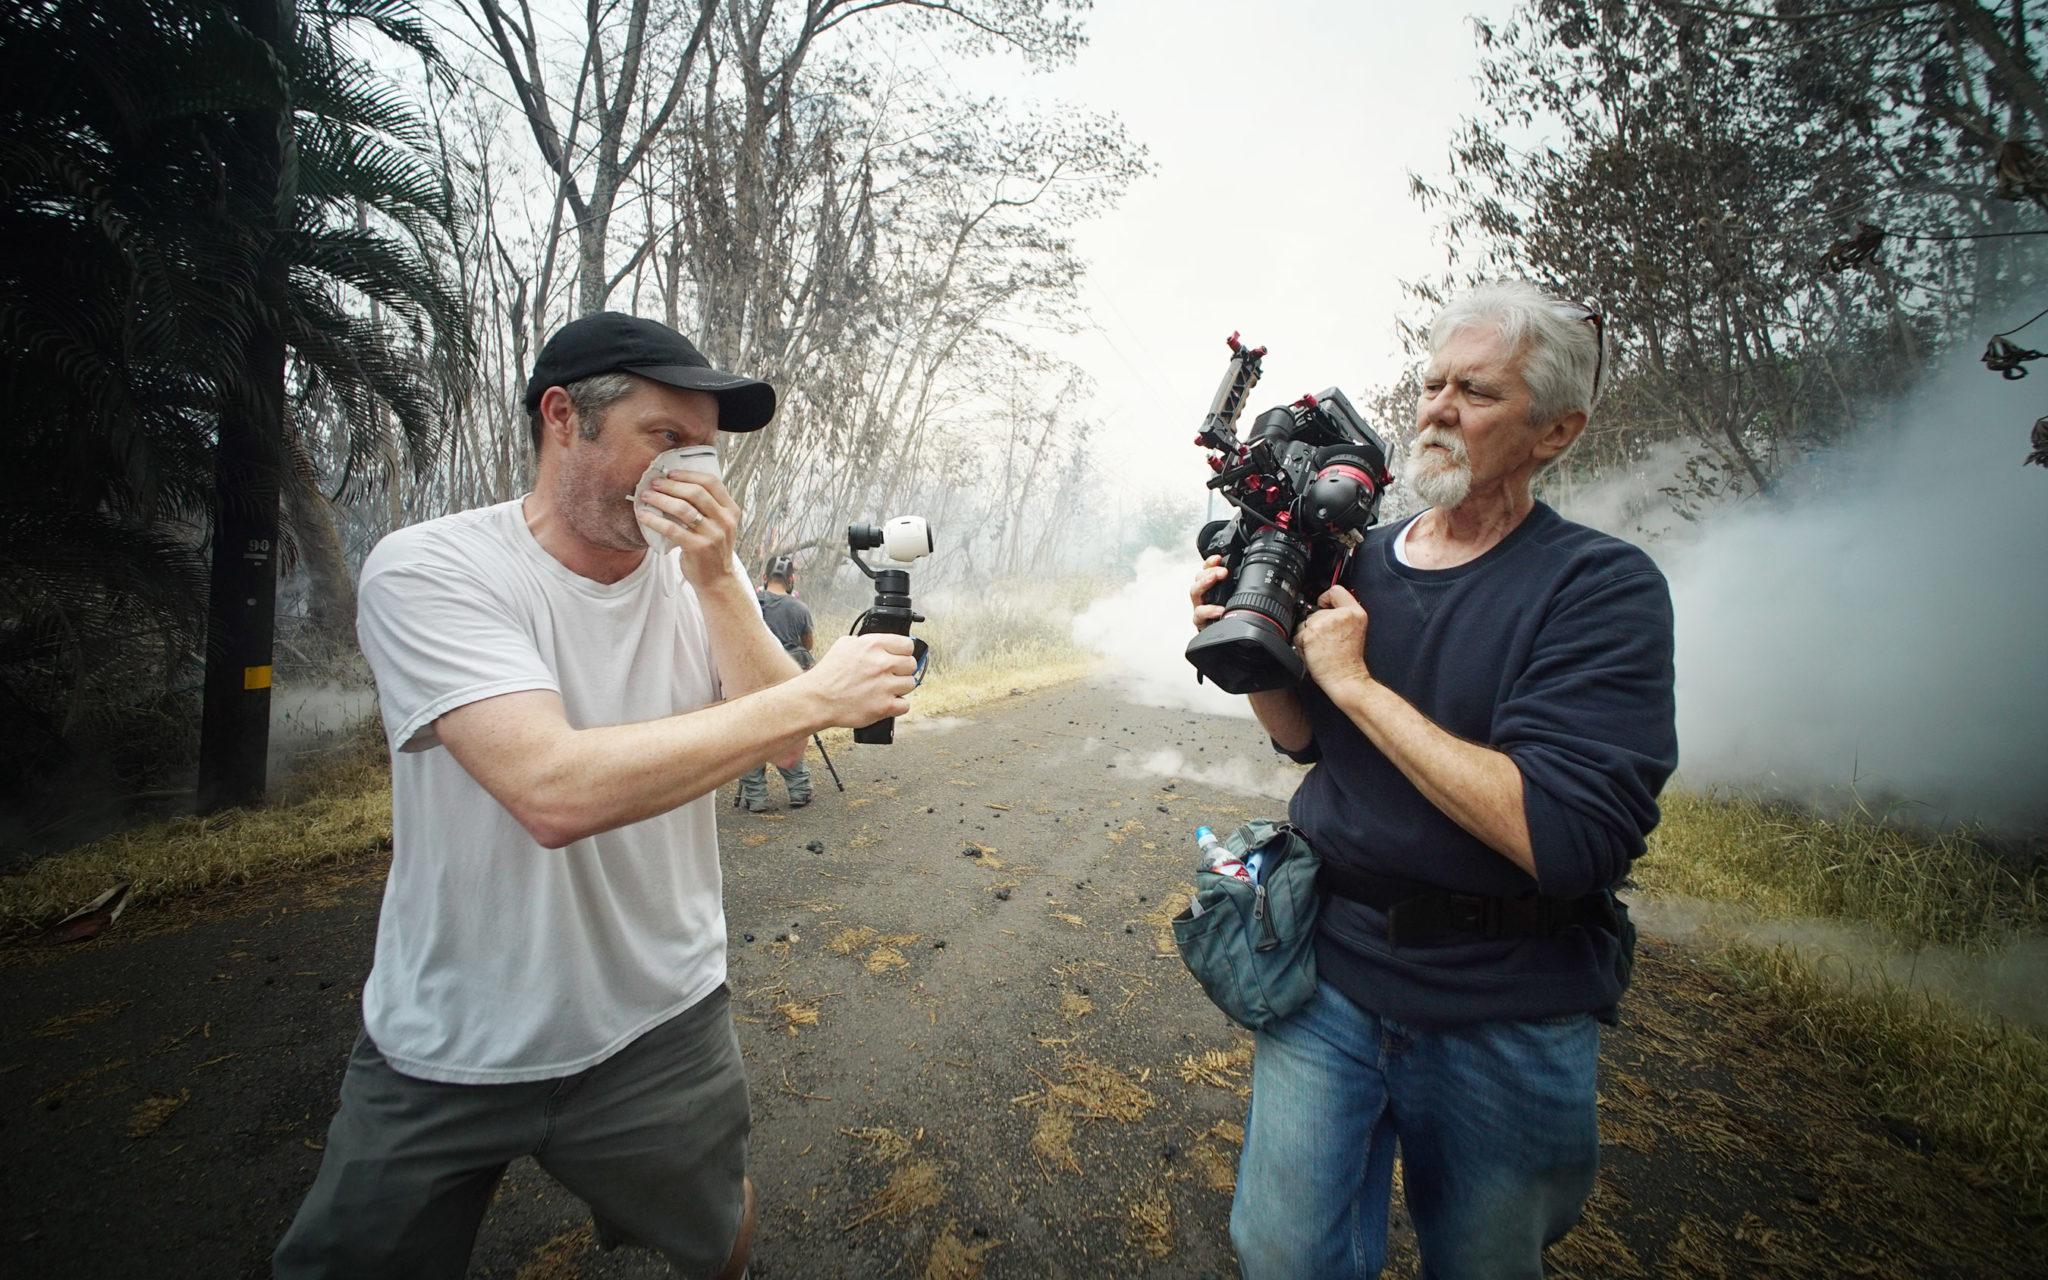 <p>Tim Coakley films Leilani Estates resident and volcano filmaker Mick Kalber along Kahukai Street.</p>